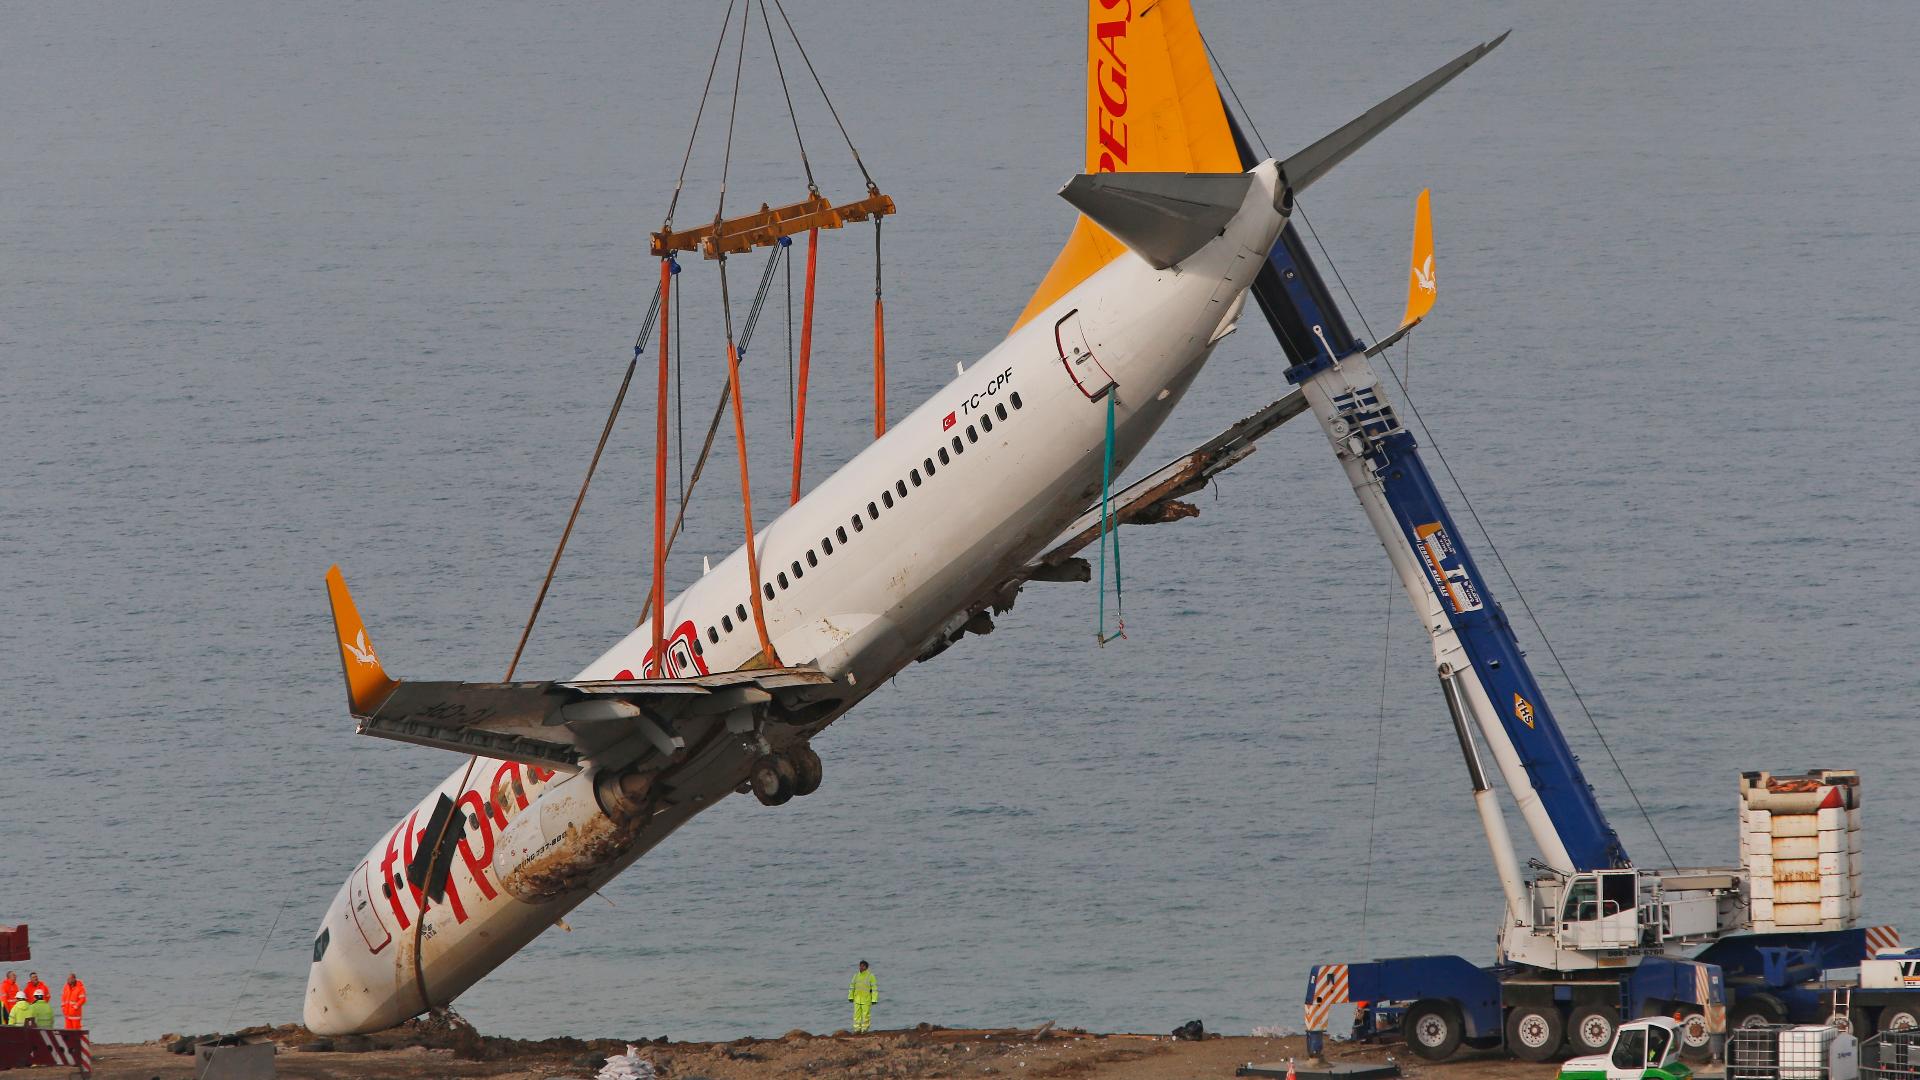 Turkey lifts plane stuck on Black Sea cliff after it skidded off runway